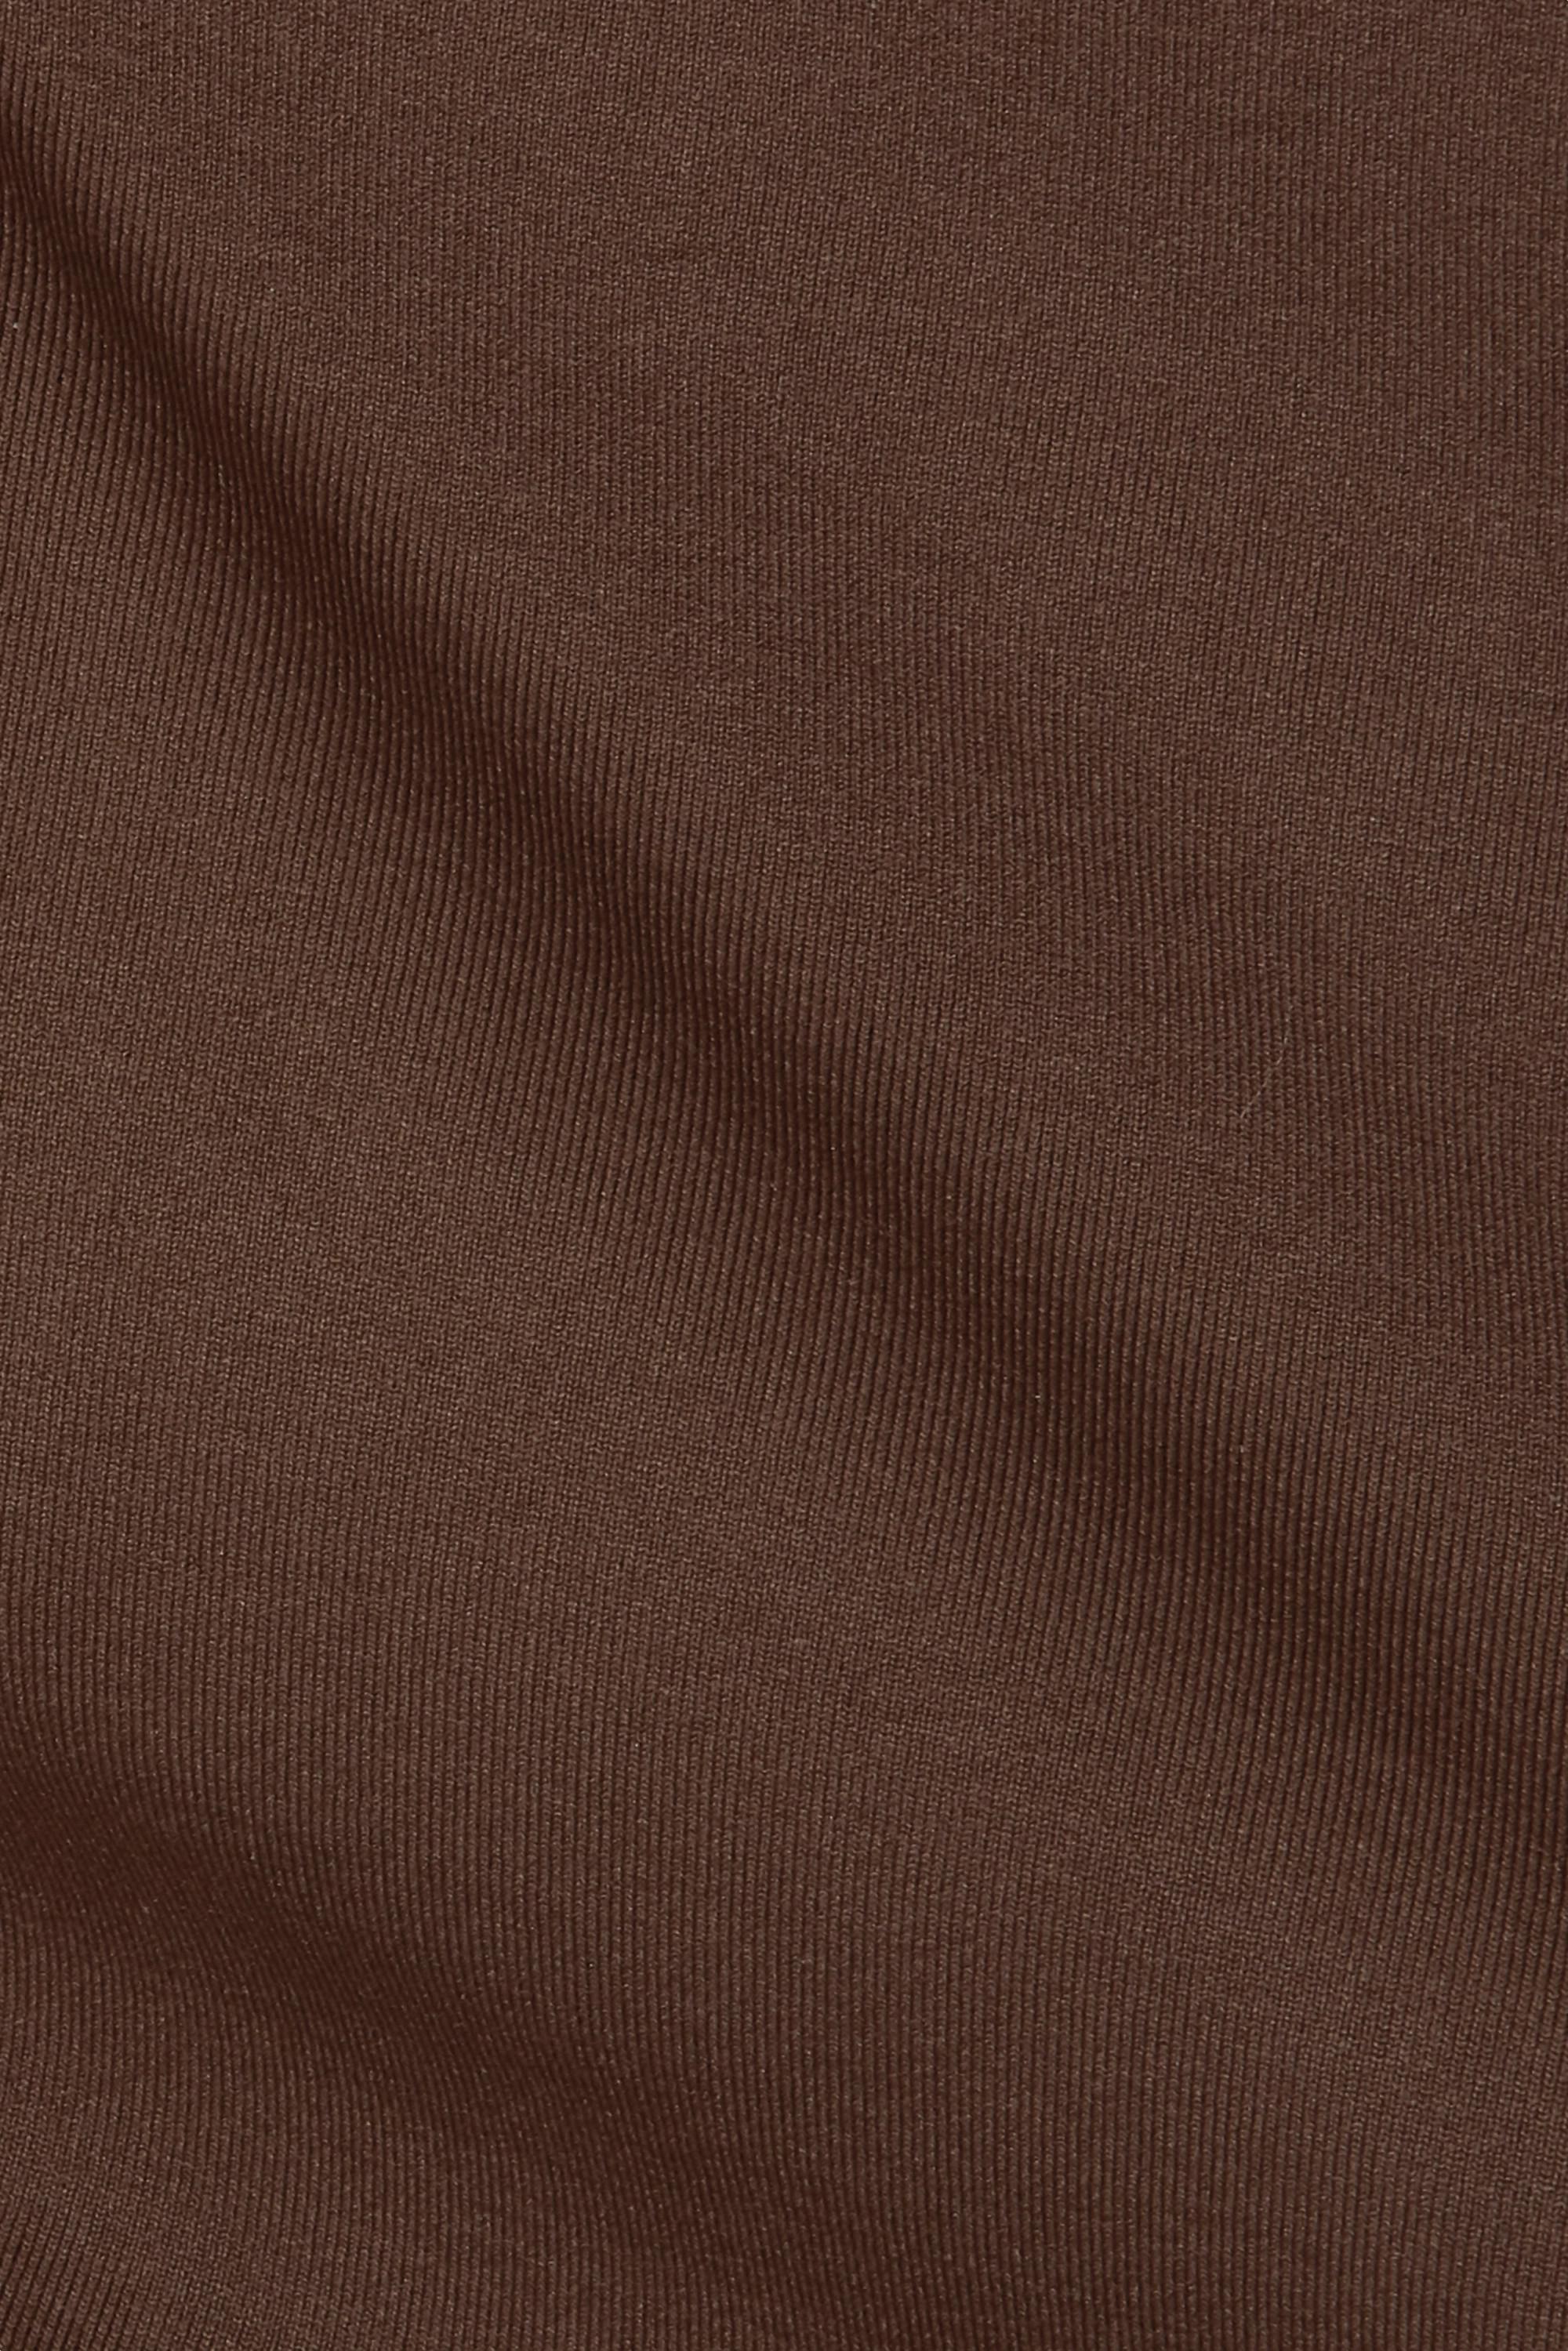 SKIMS Essential Mock Neck bodysuit - Smokey Quartz